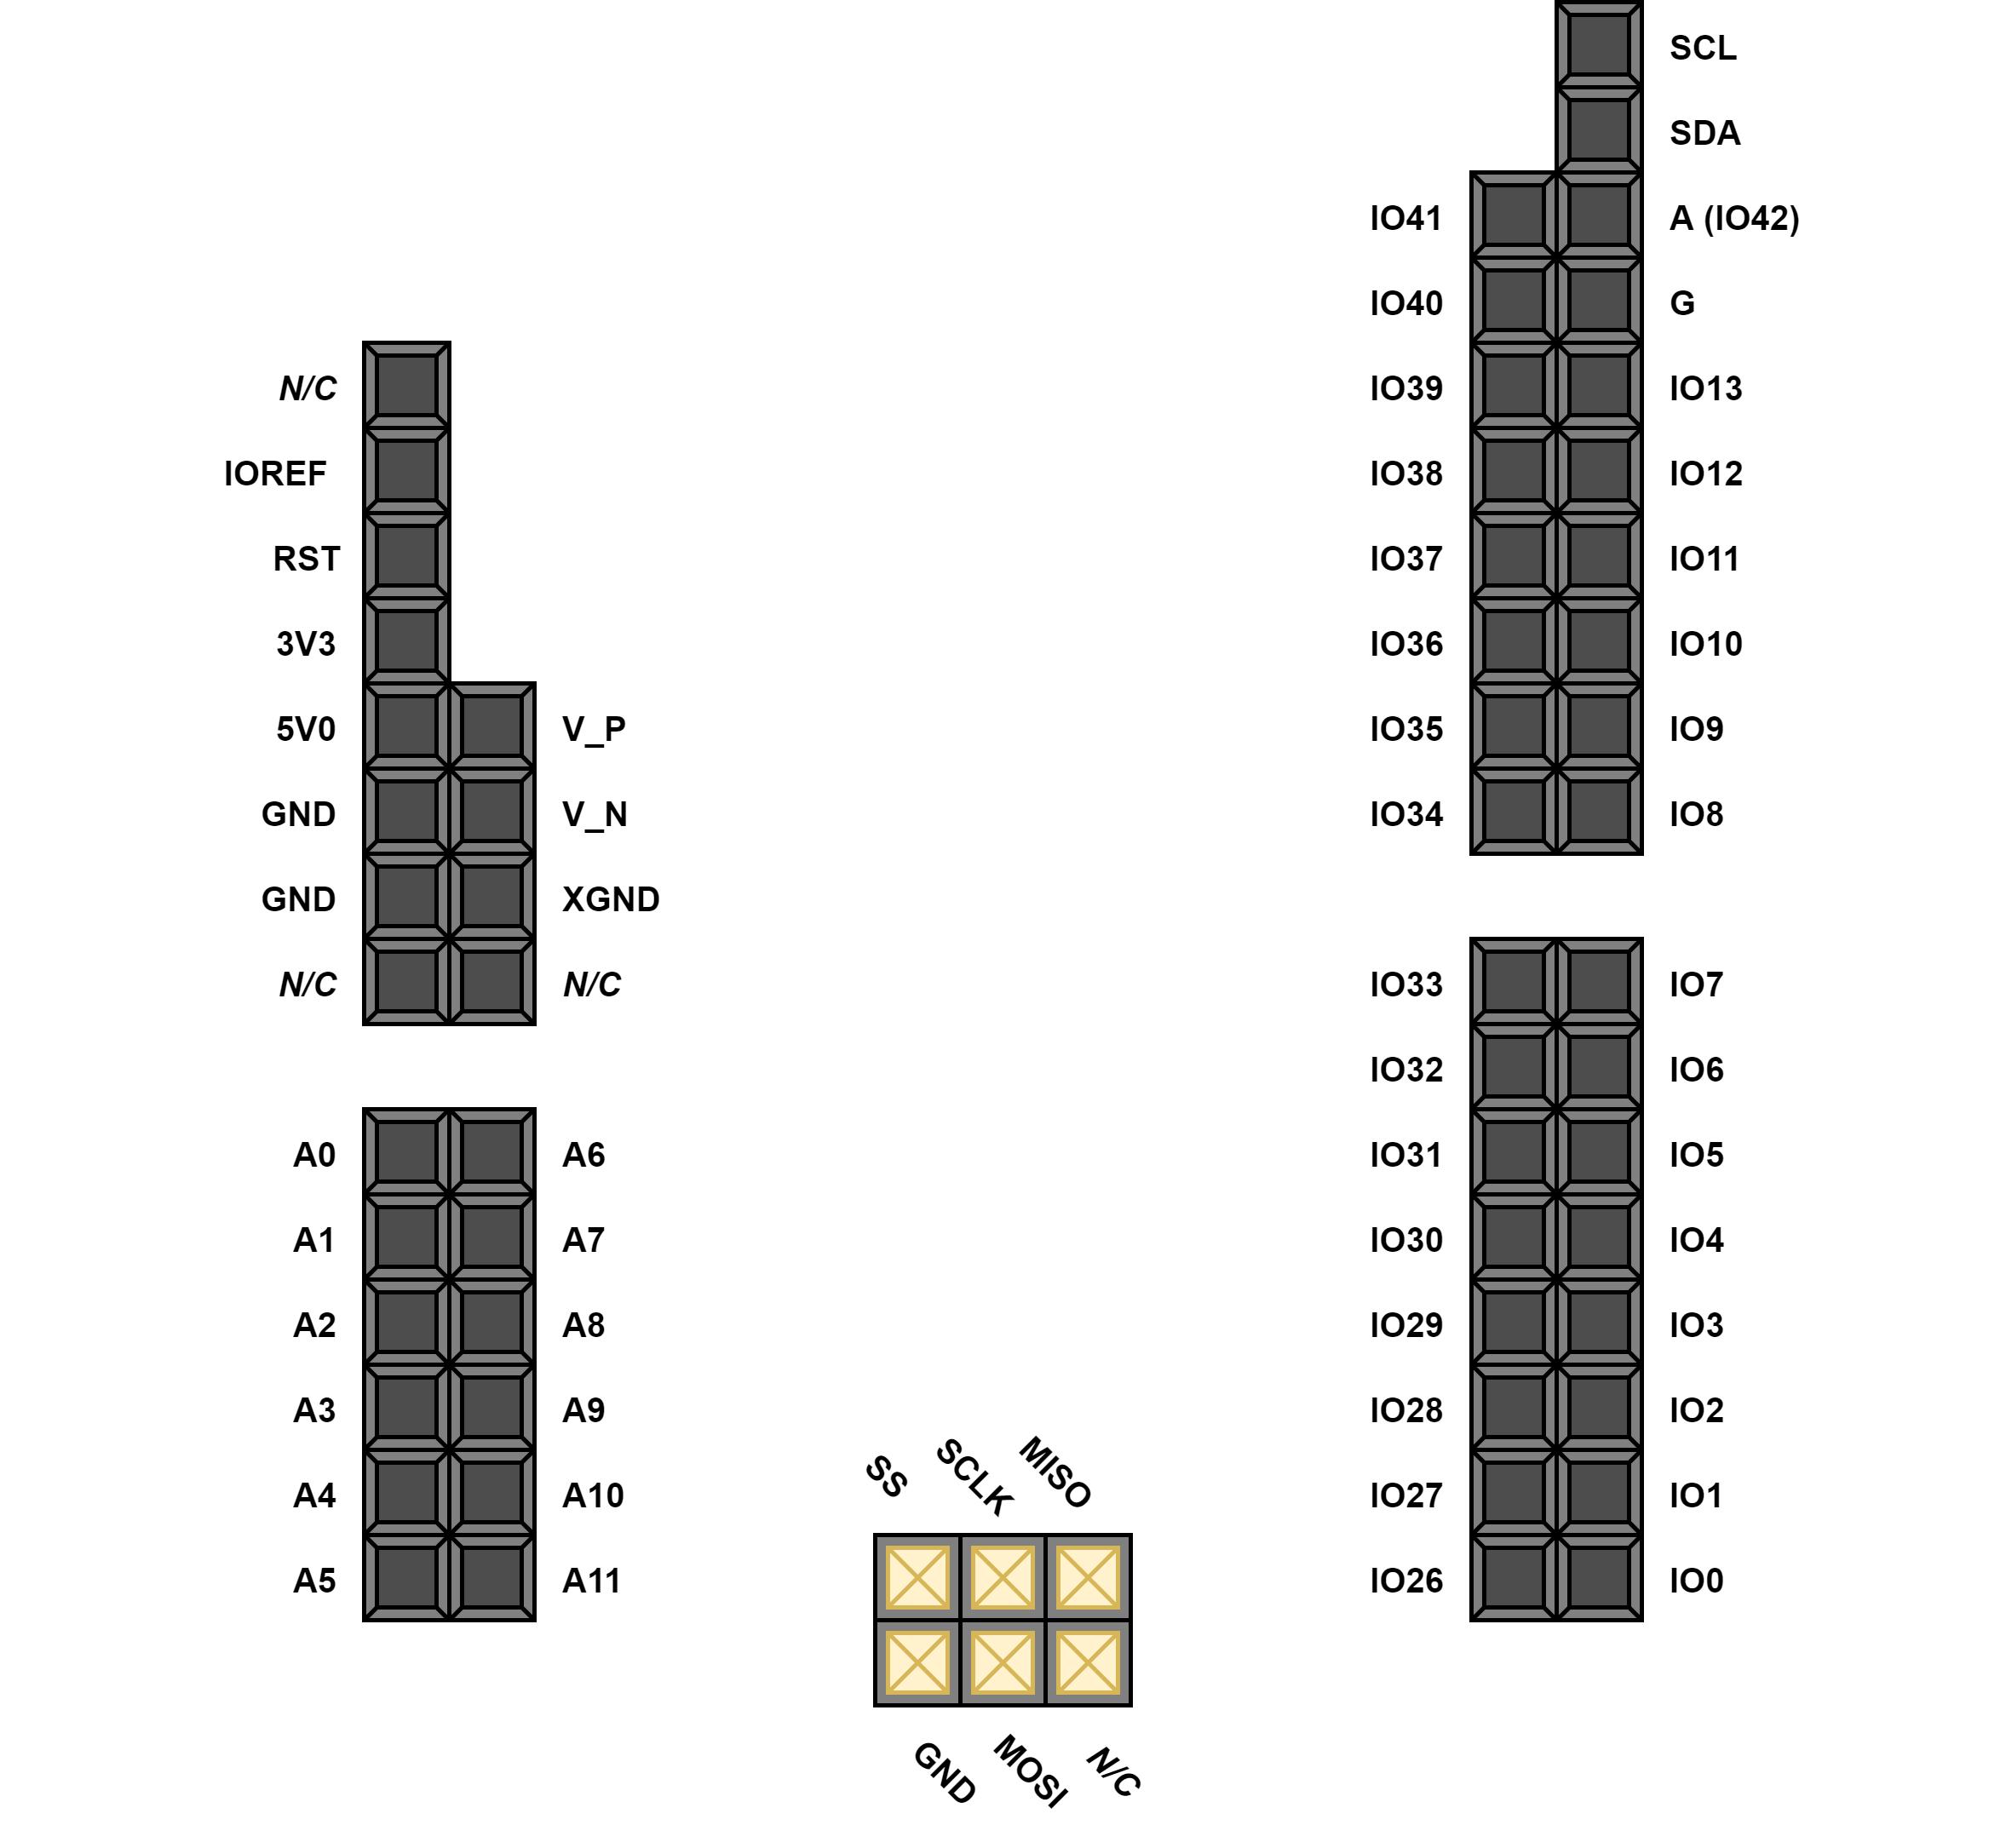 Cora Z7 Reference Manual Referencedigilentinc Digilent Jtag Cable Schematic Usb Shield Connector Pin Diagram